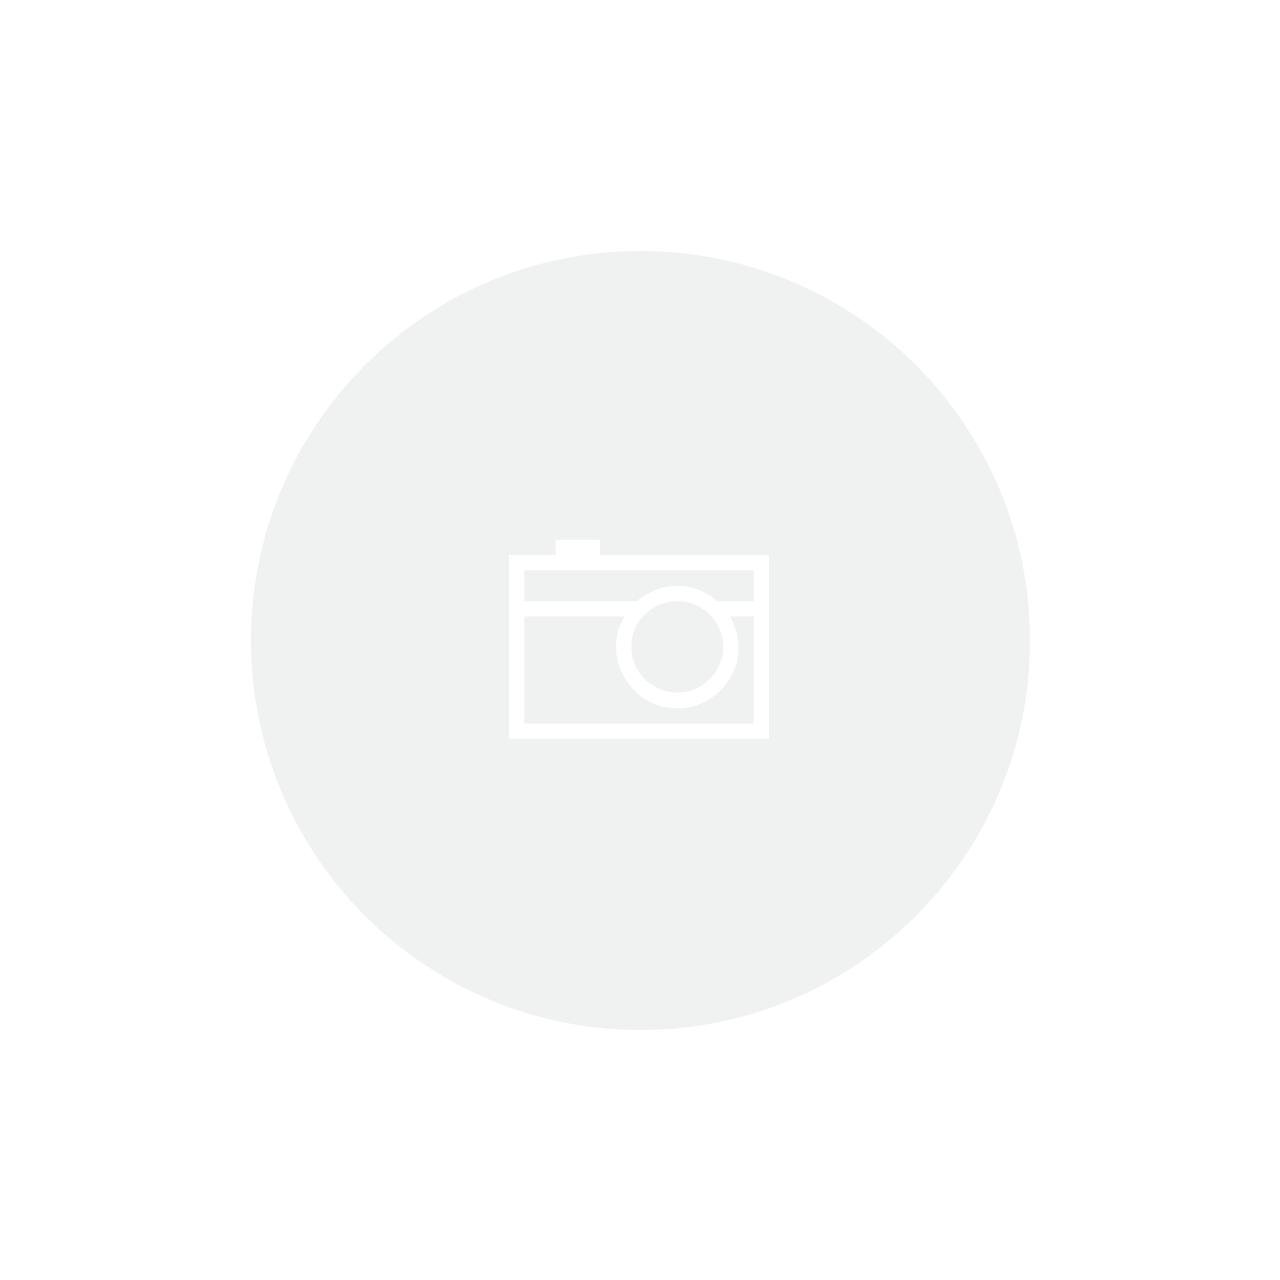 FONE DE OUVIDO COOLER MASTER SIRIUS-C, SGH-4650-KC3D1